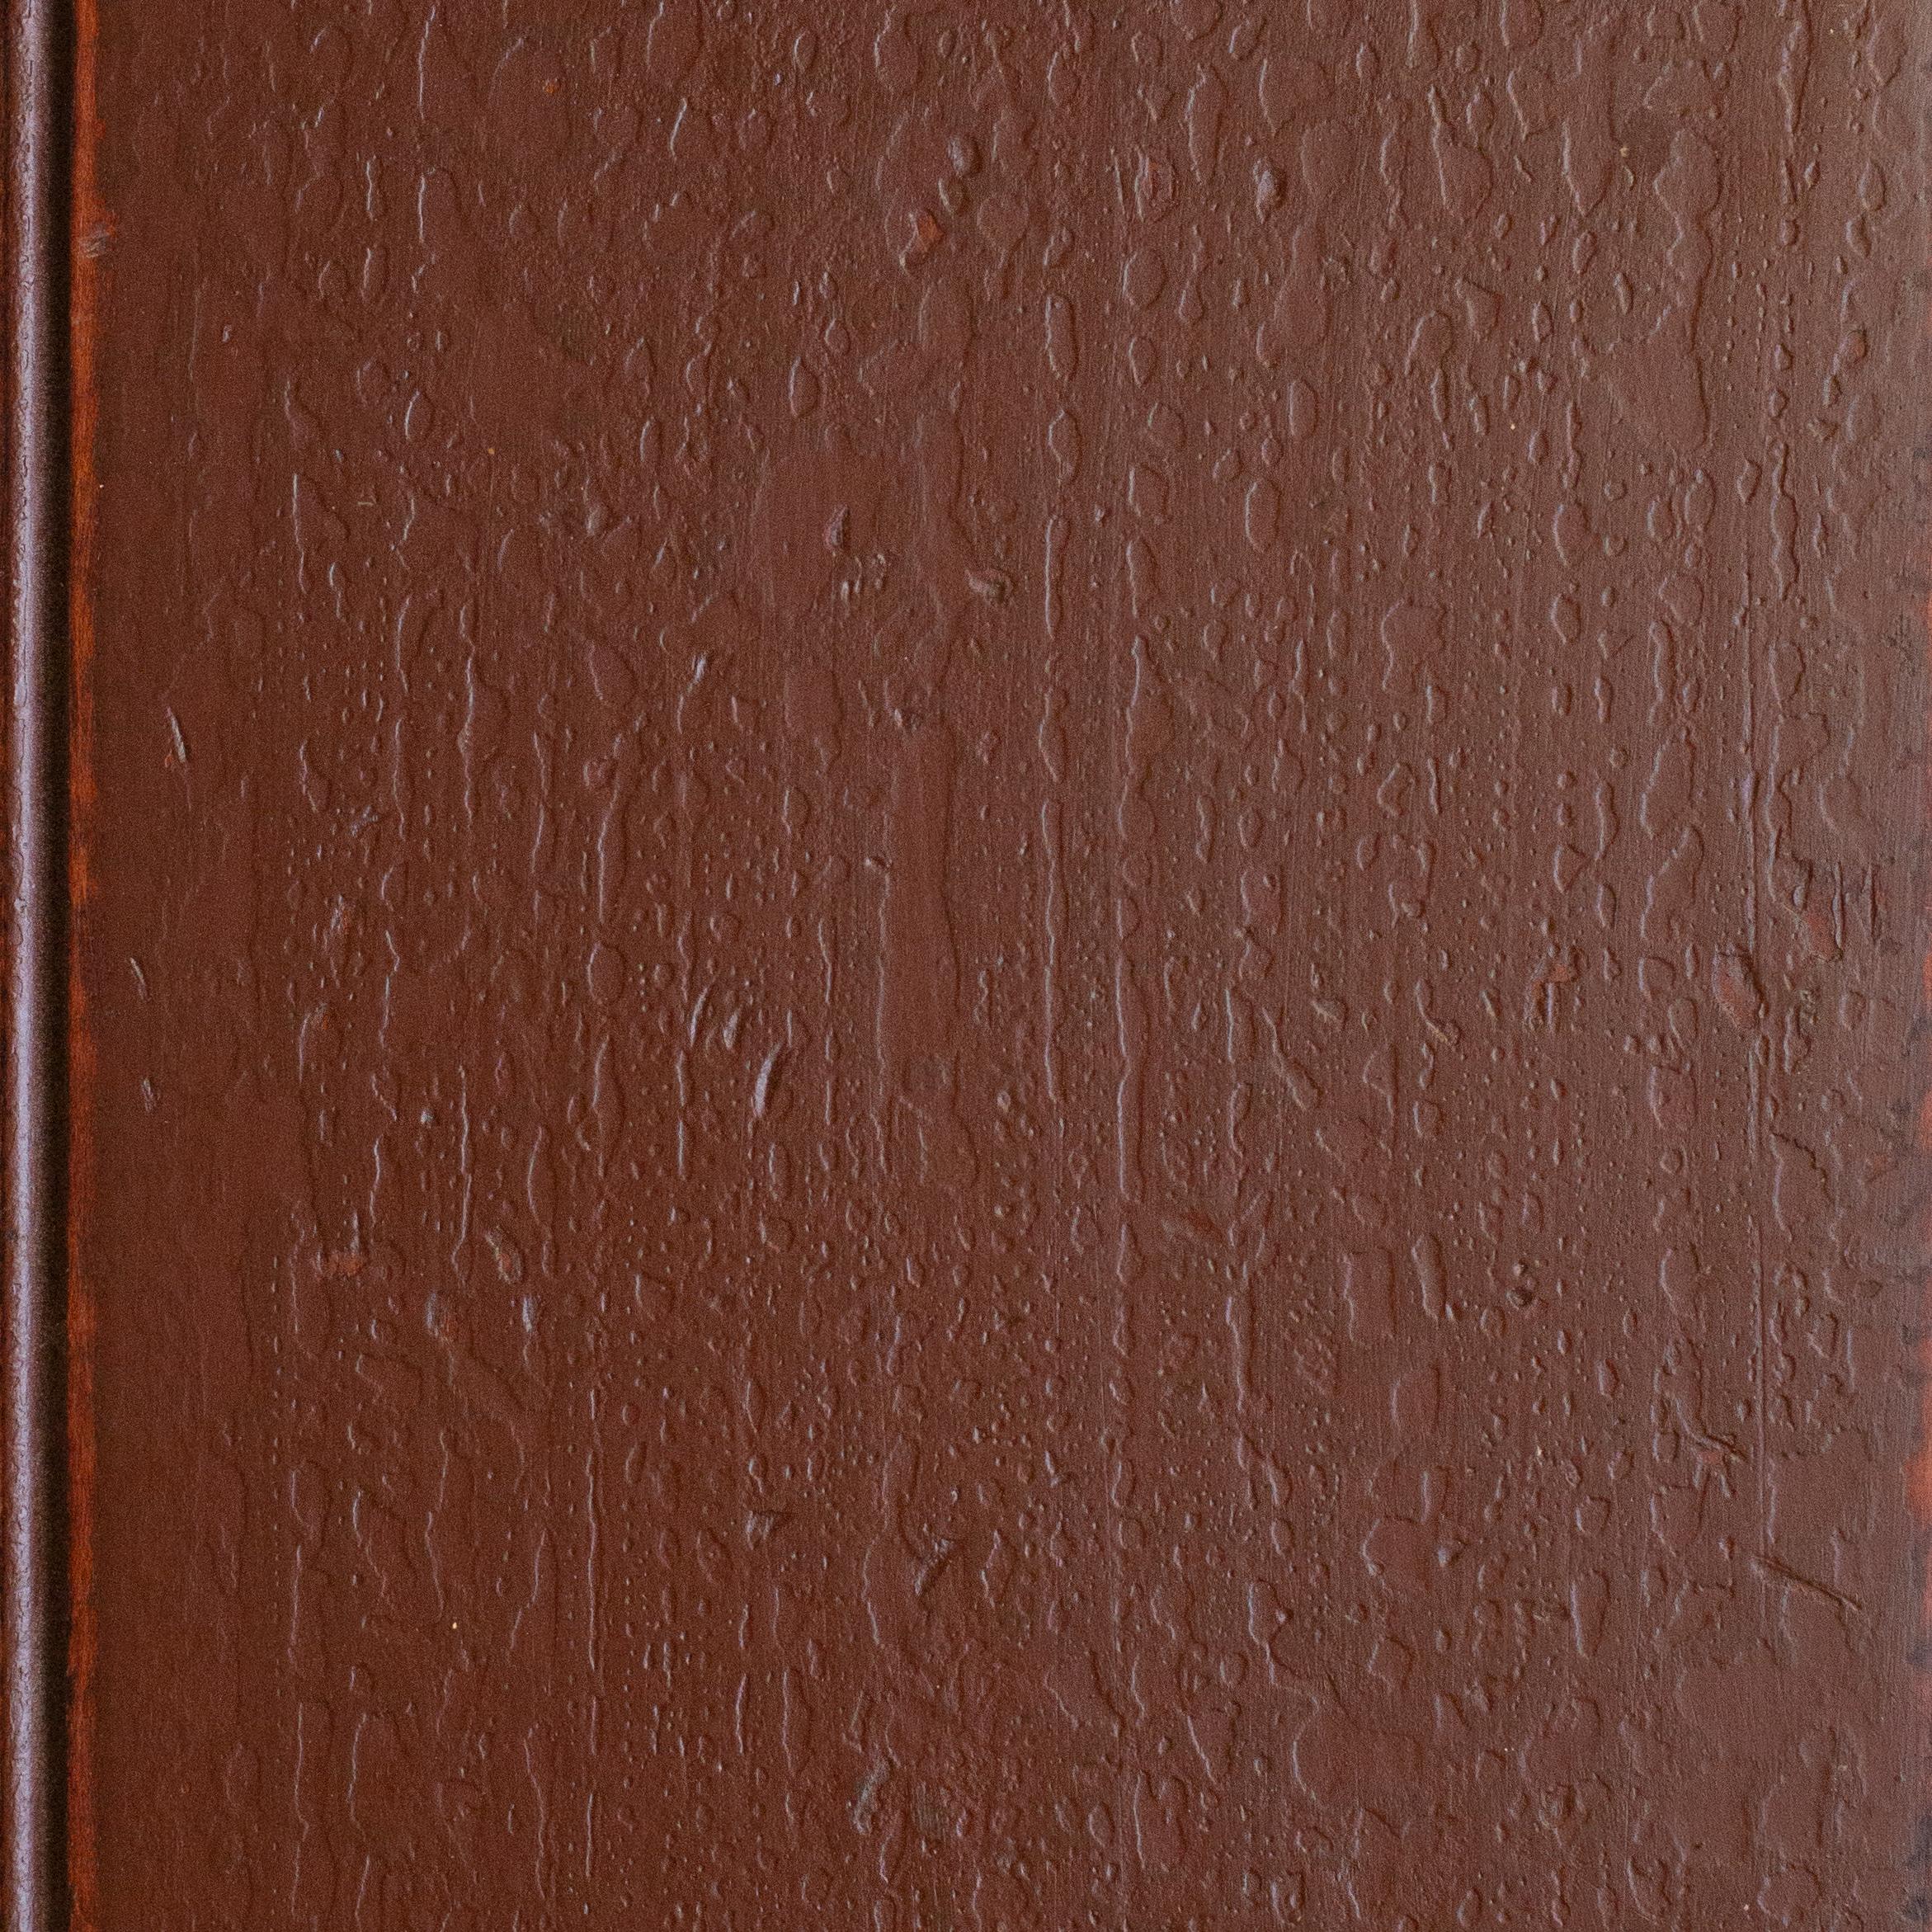 Dark Red - Chared Oak